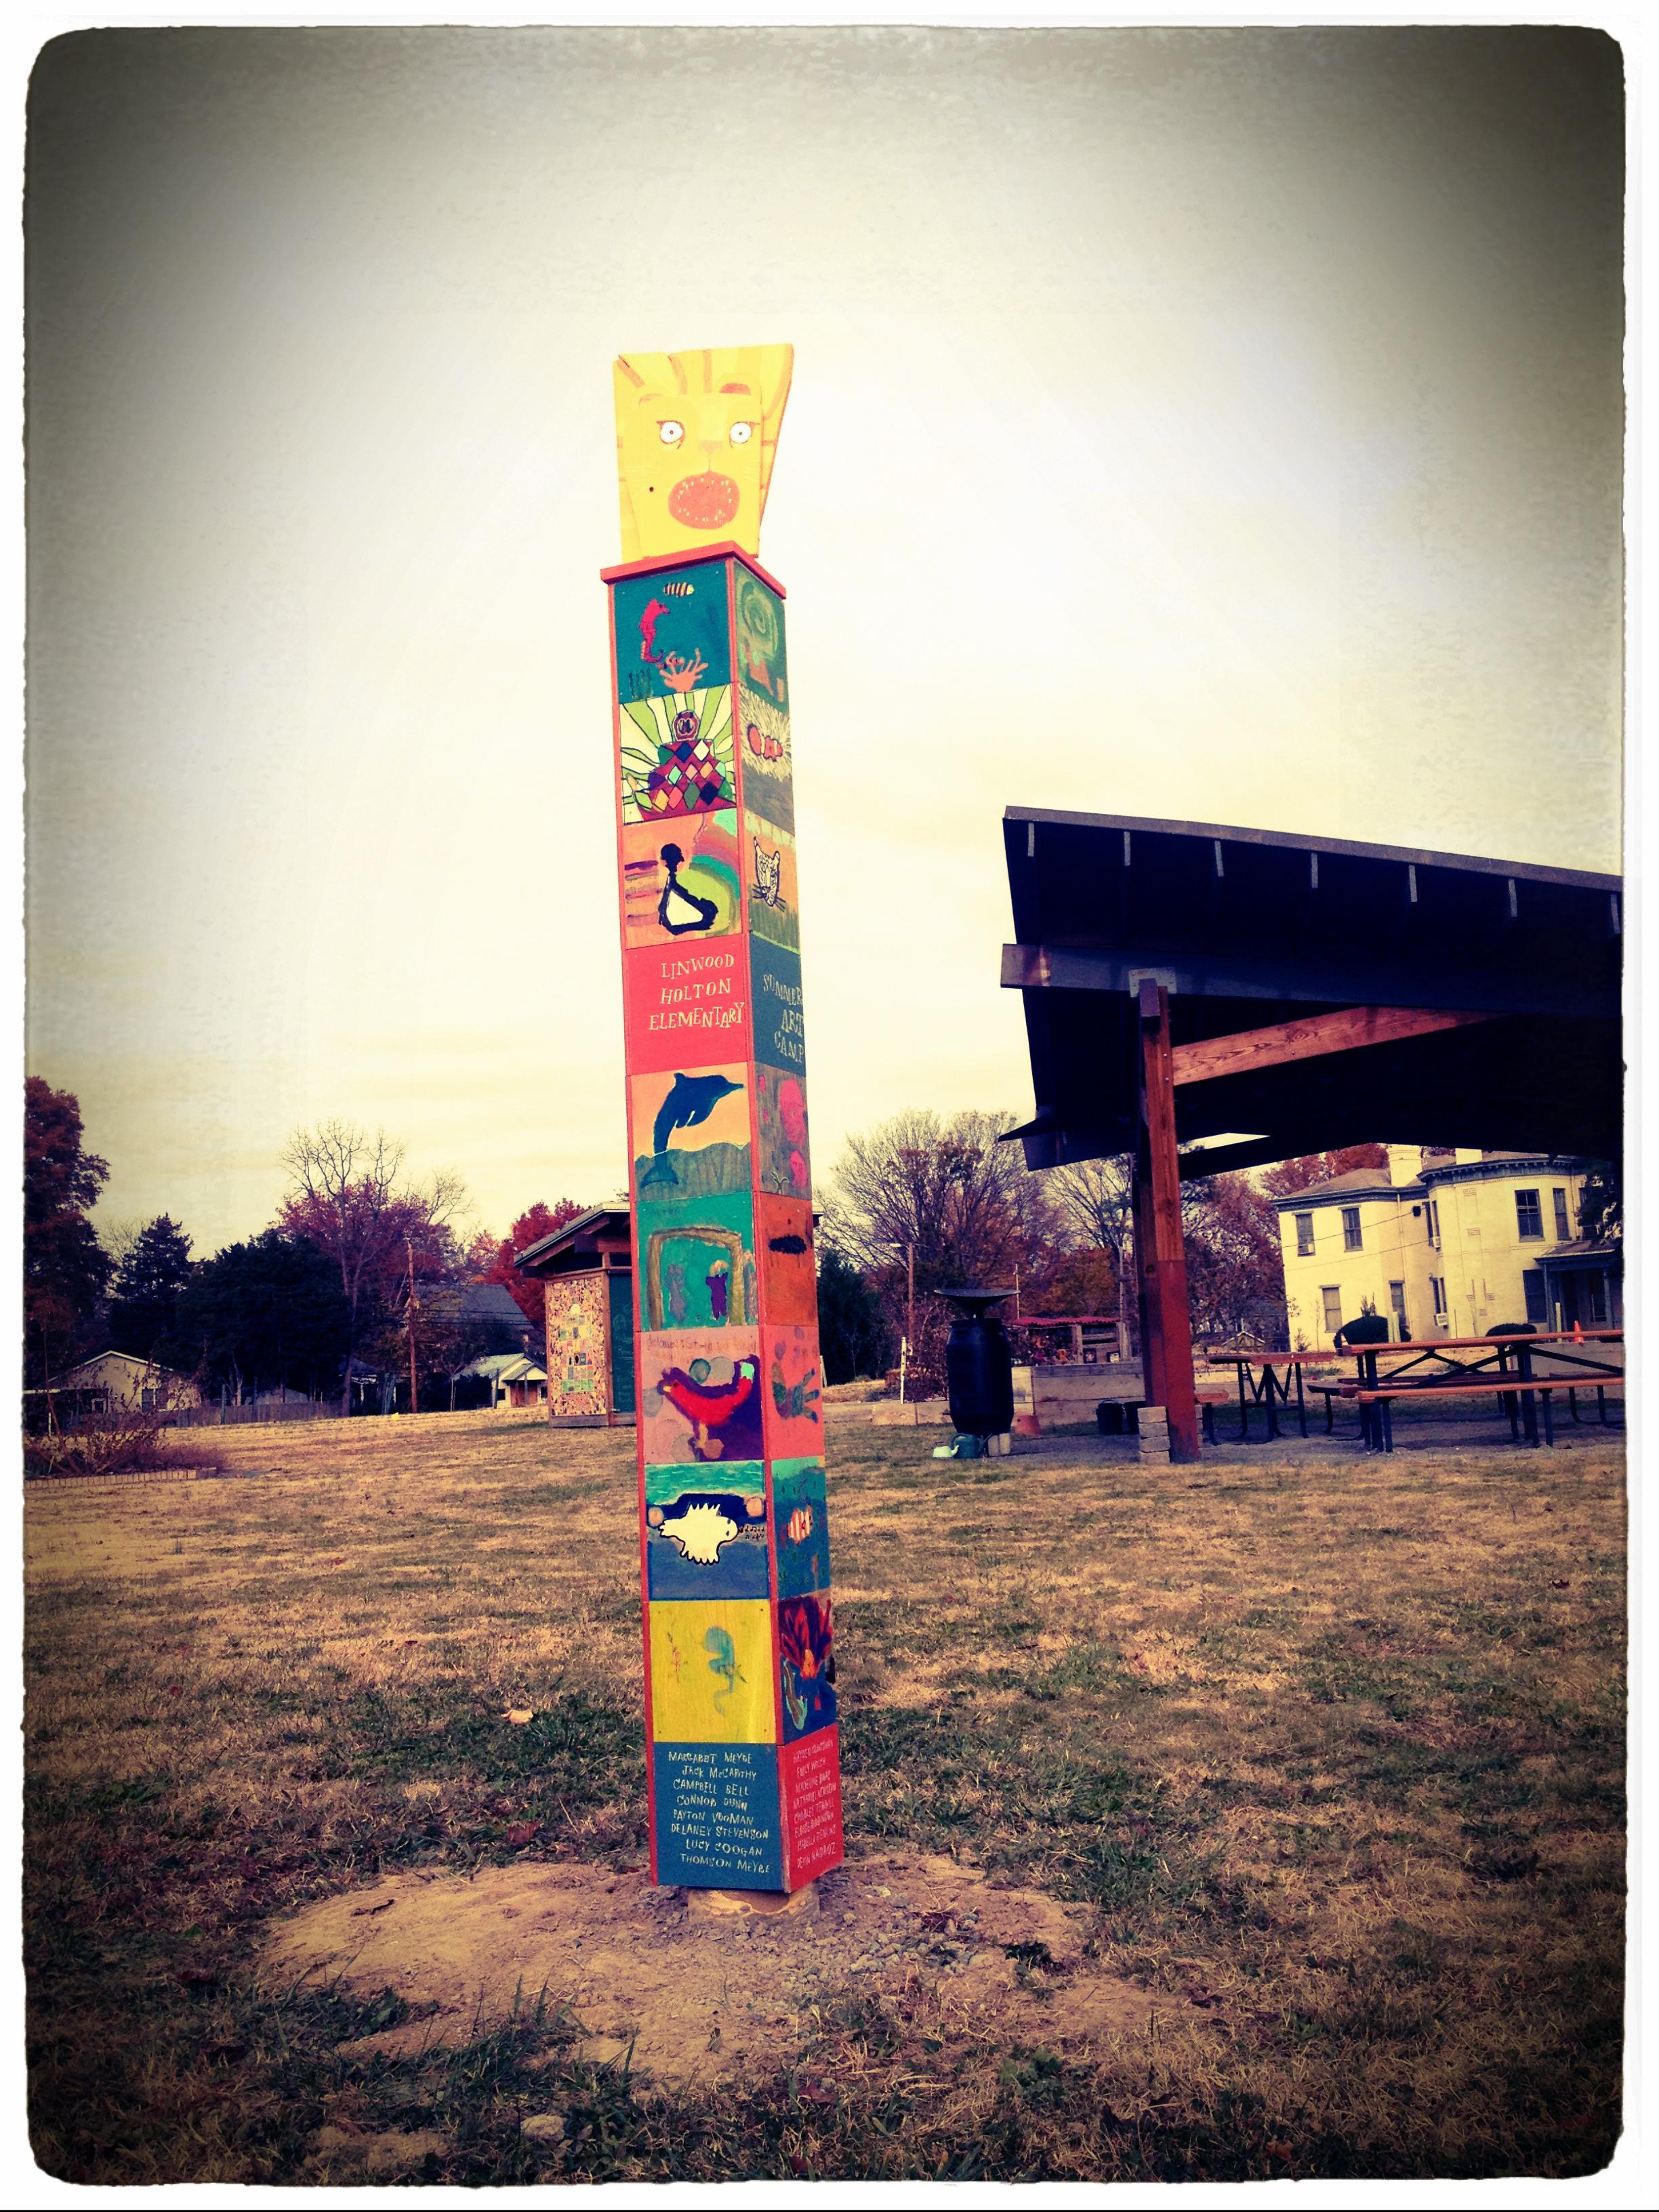 Holton Elementary School Totem, Richmond